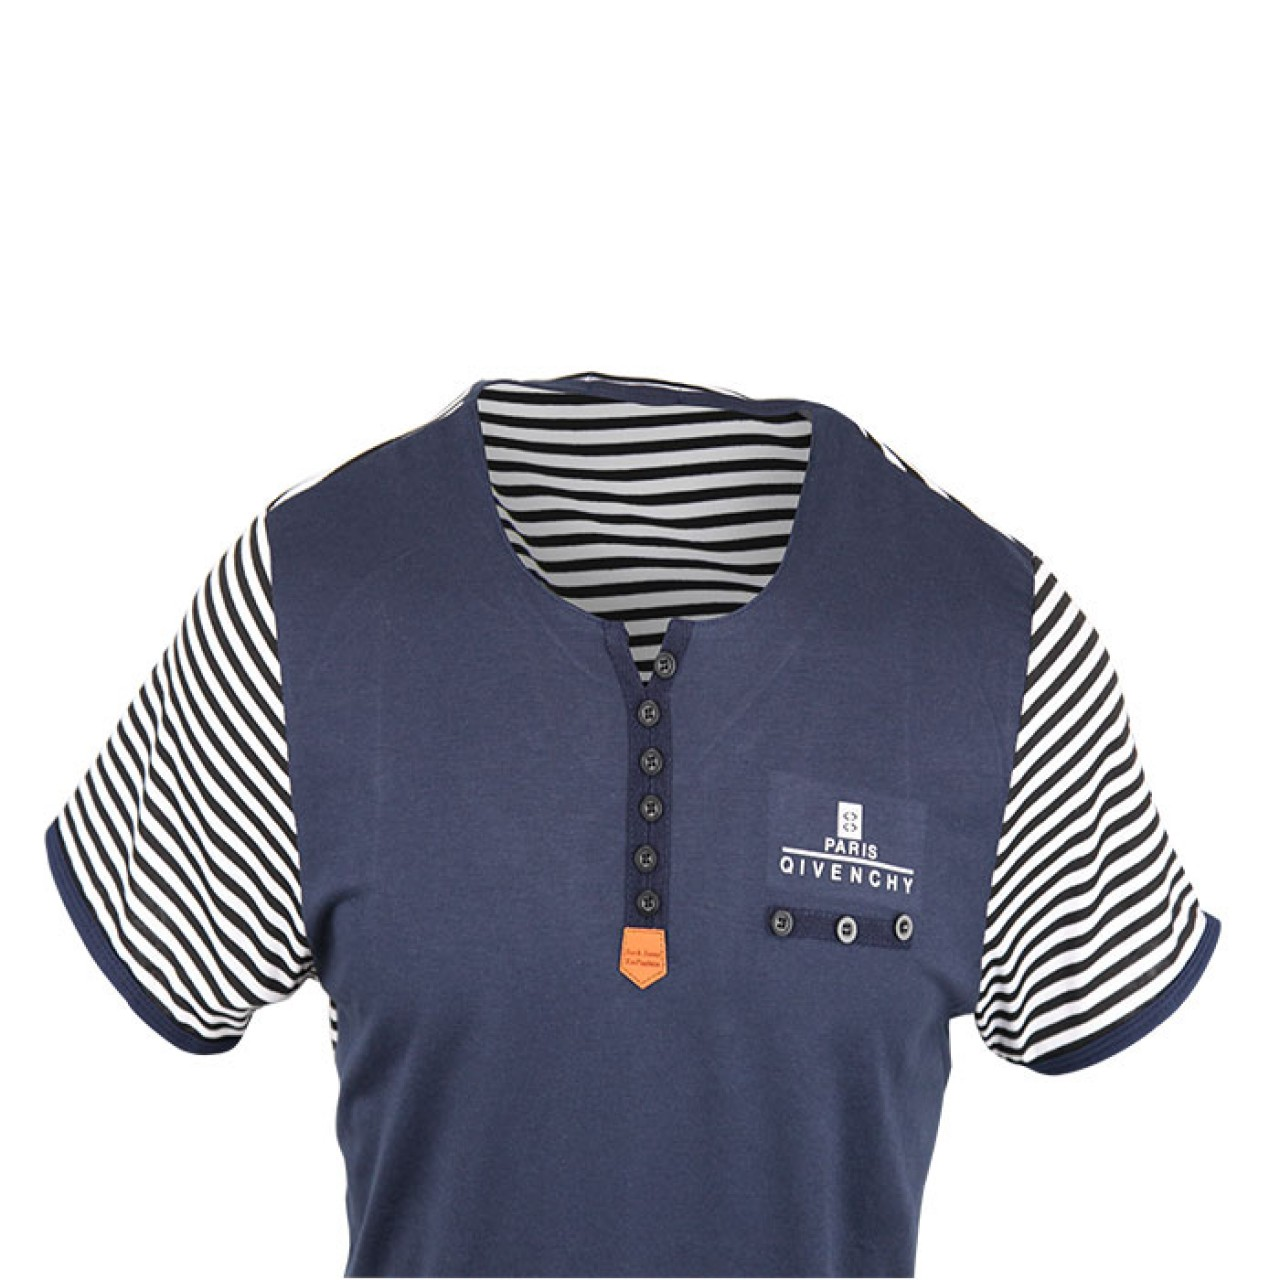 Men's Stylish Navy Blue Striped Crew Neck Tee